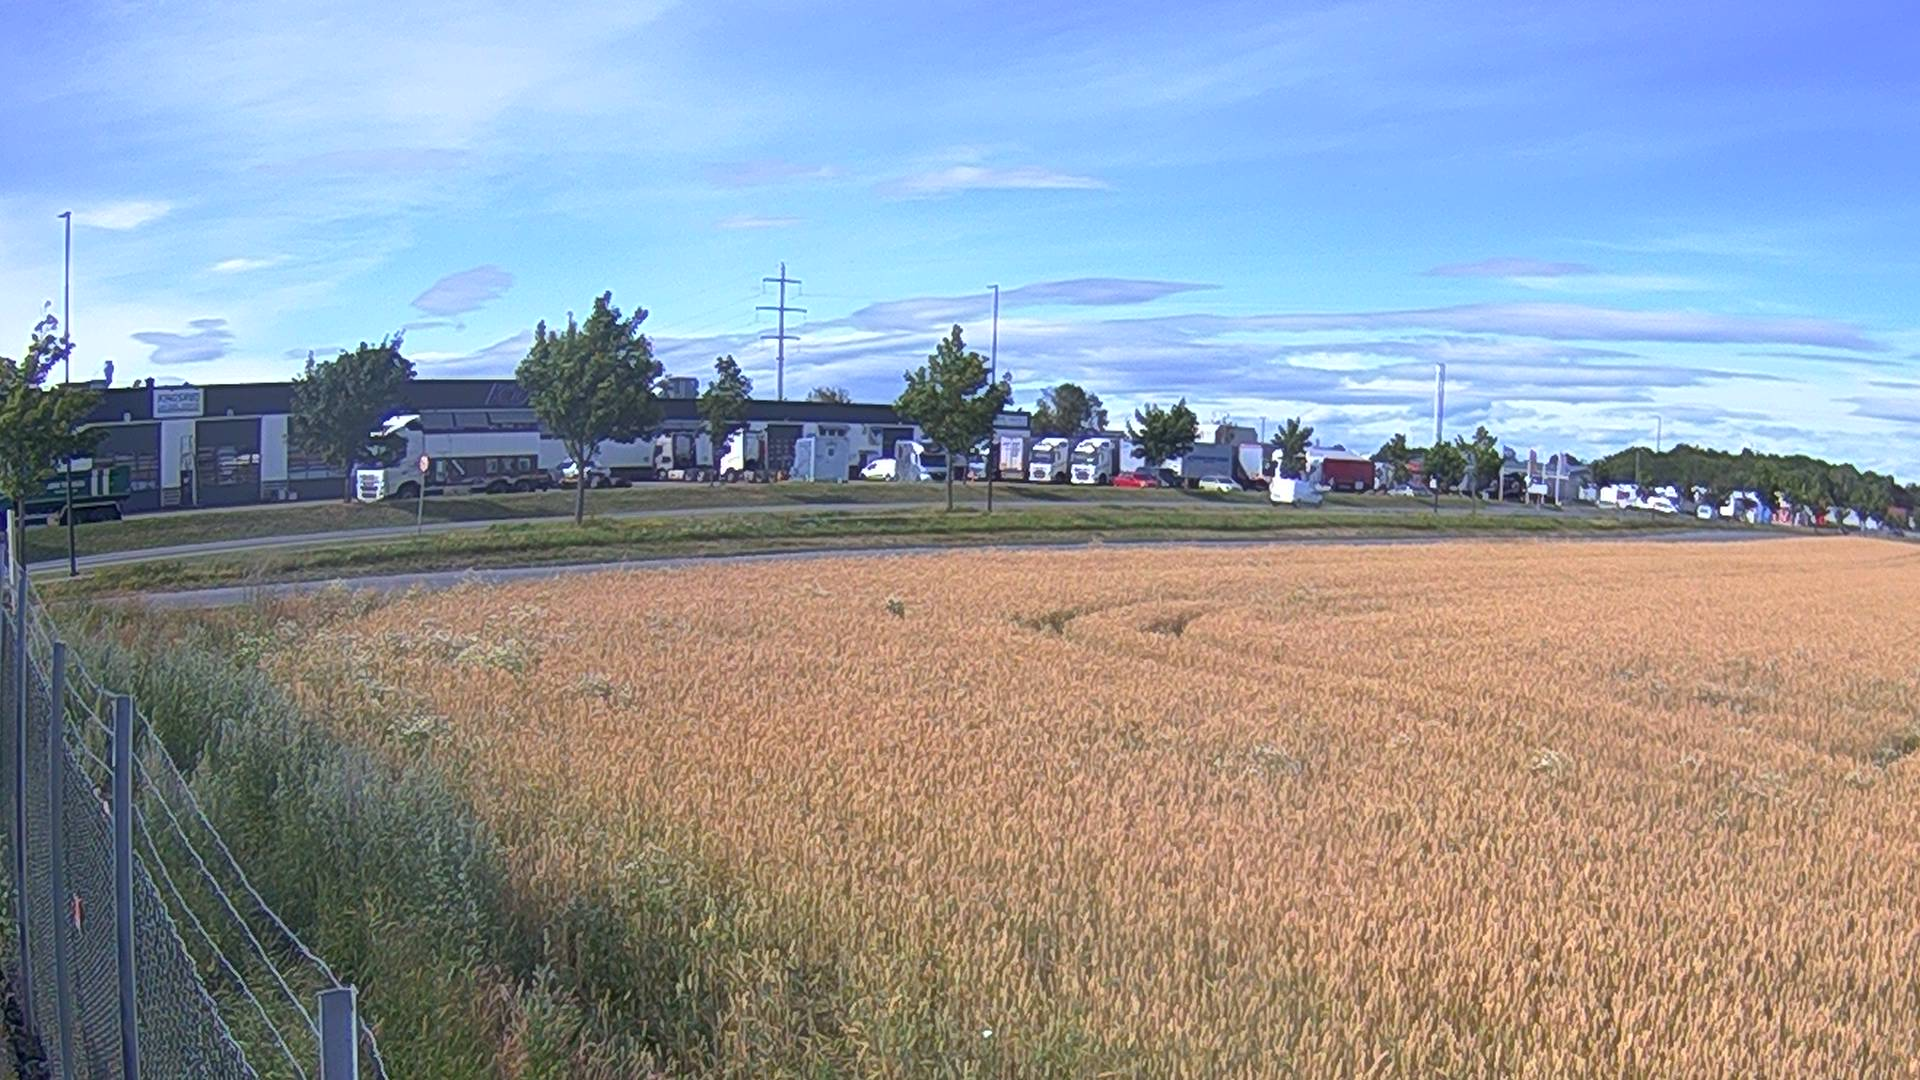 Sarpsborg - Gatedalen miljøanlegg